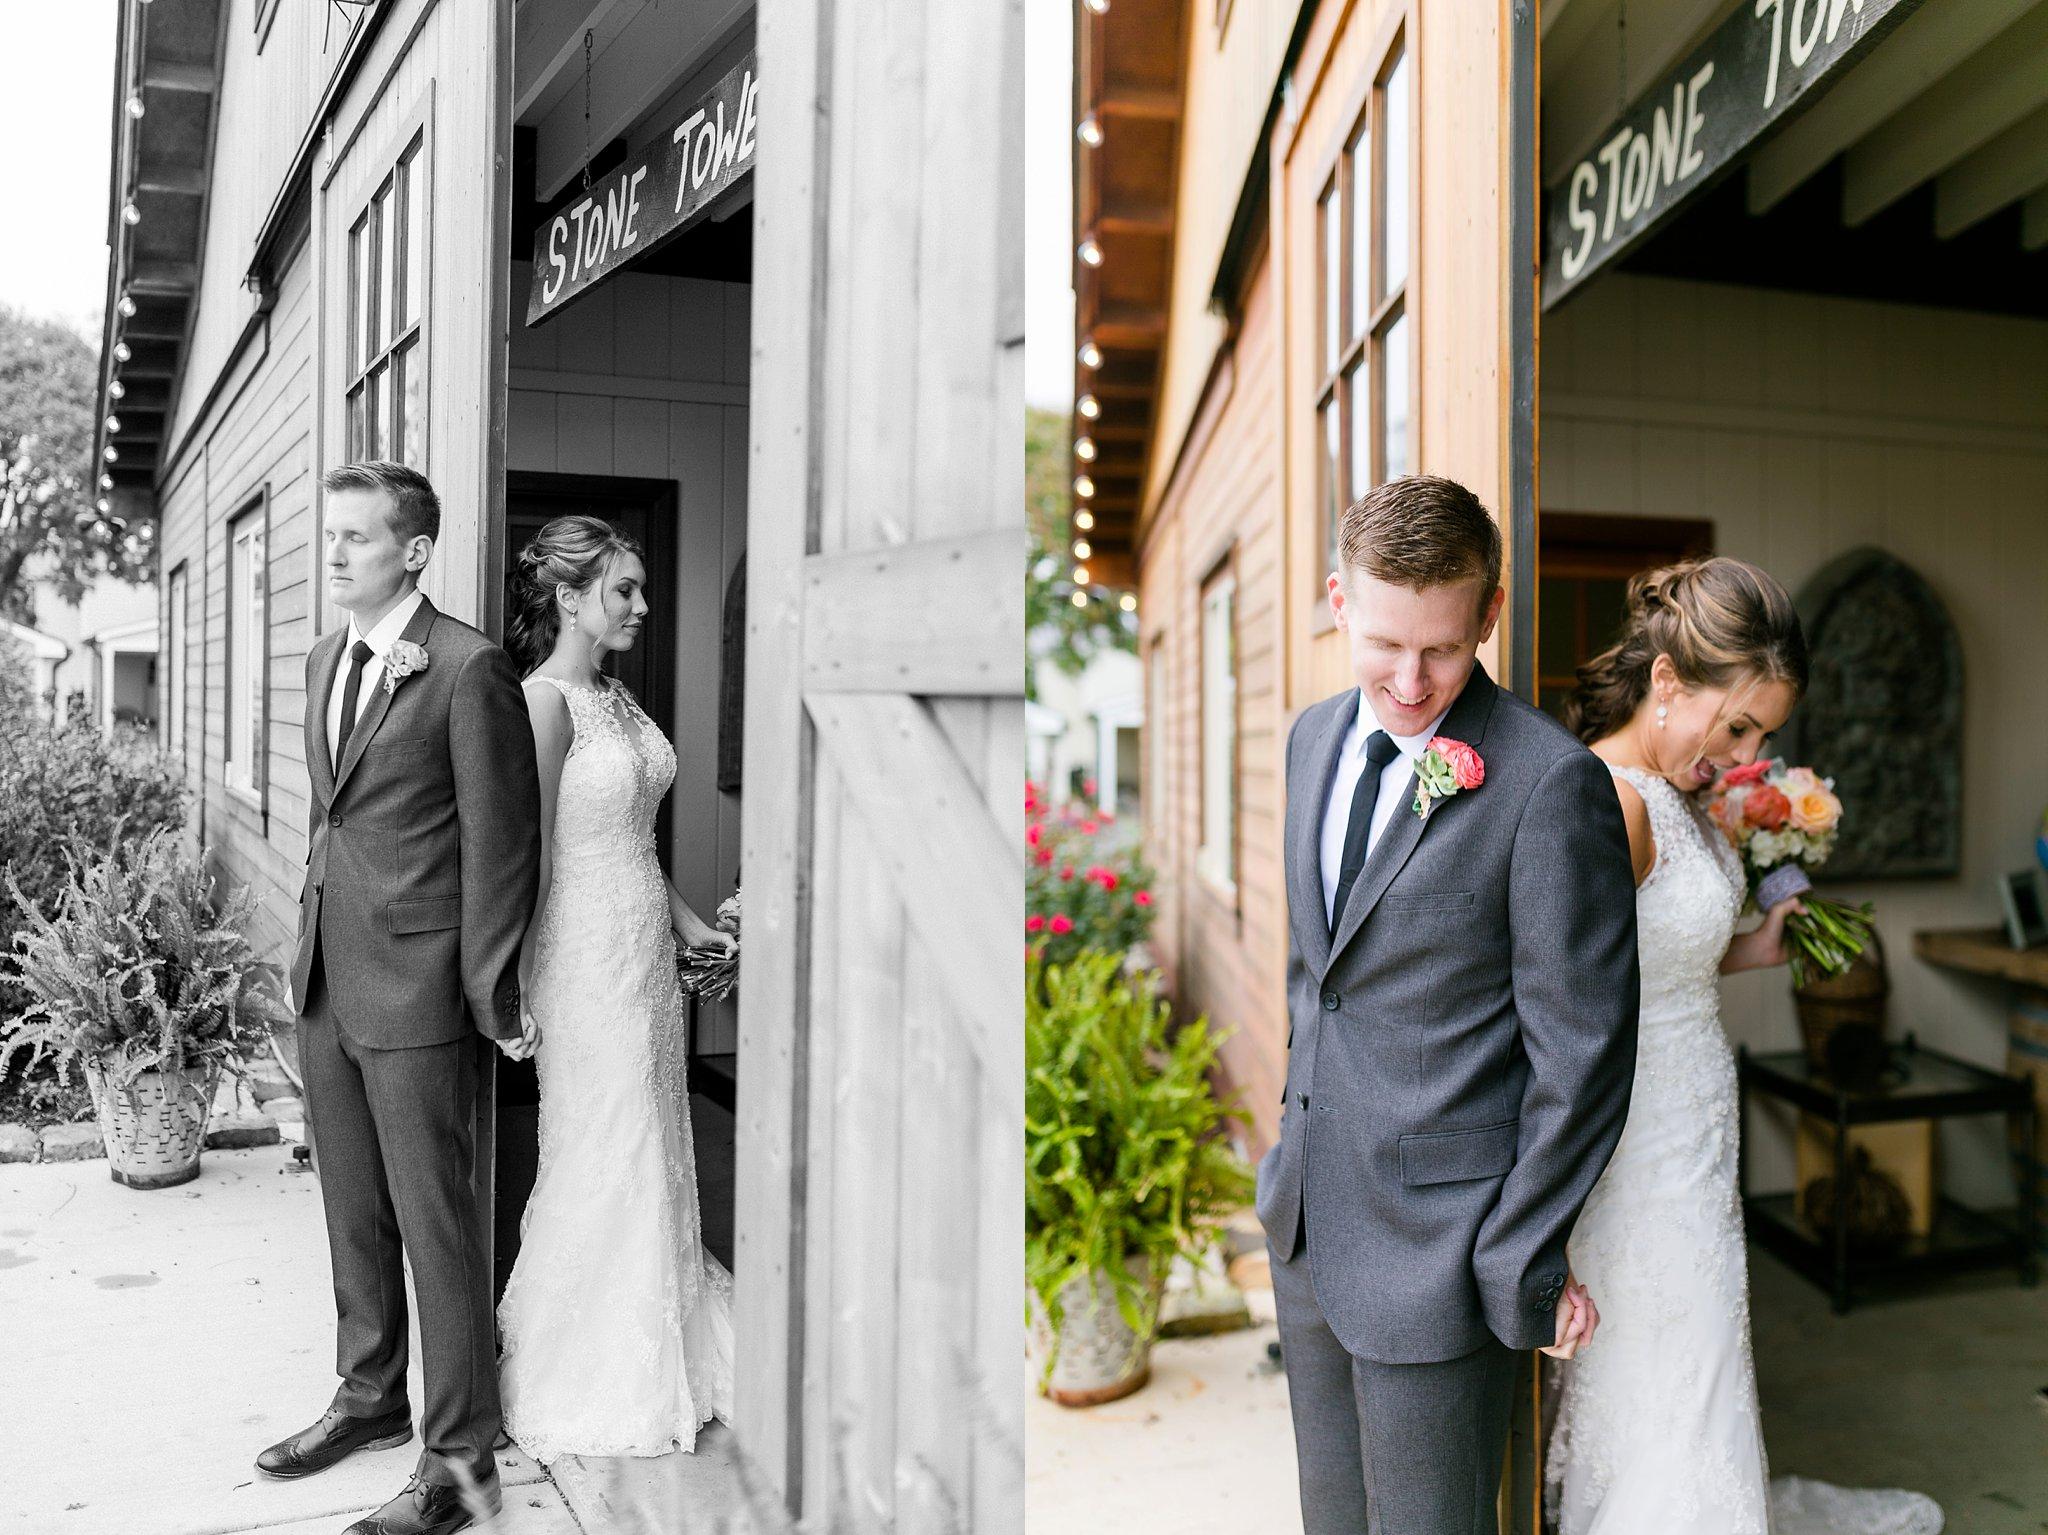 Stone Tower Winery Wedding Photos Virginia Wedding Photographer Megan Kelsey Photography Sam & Angela-138.jpg